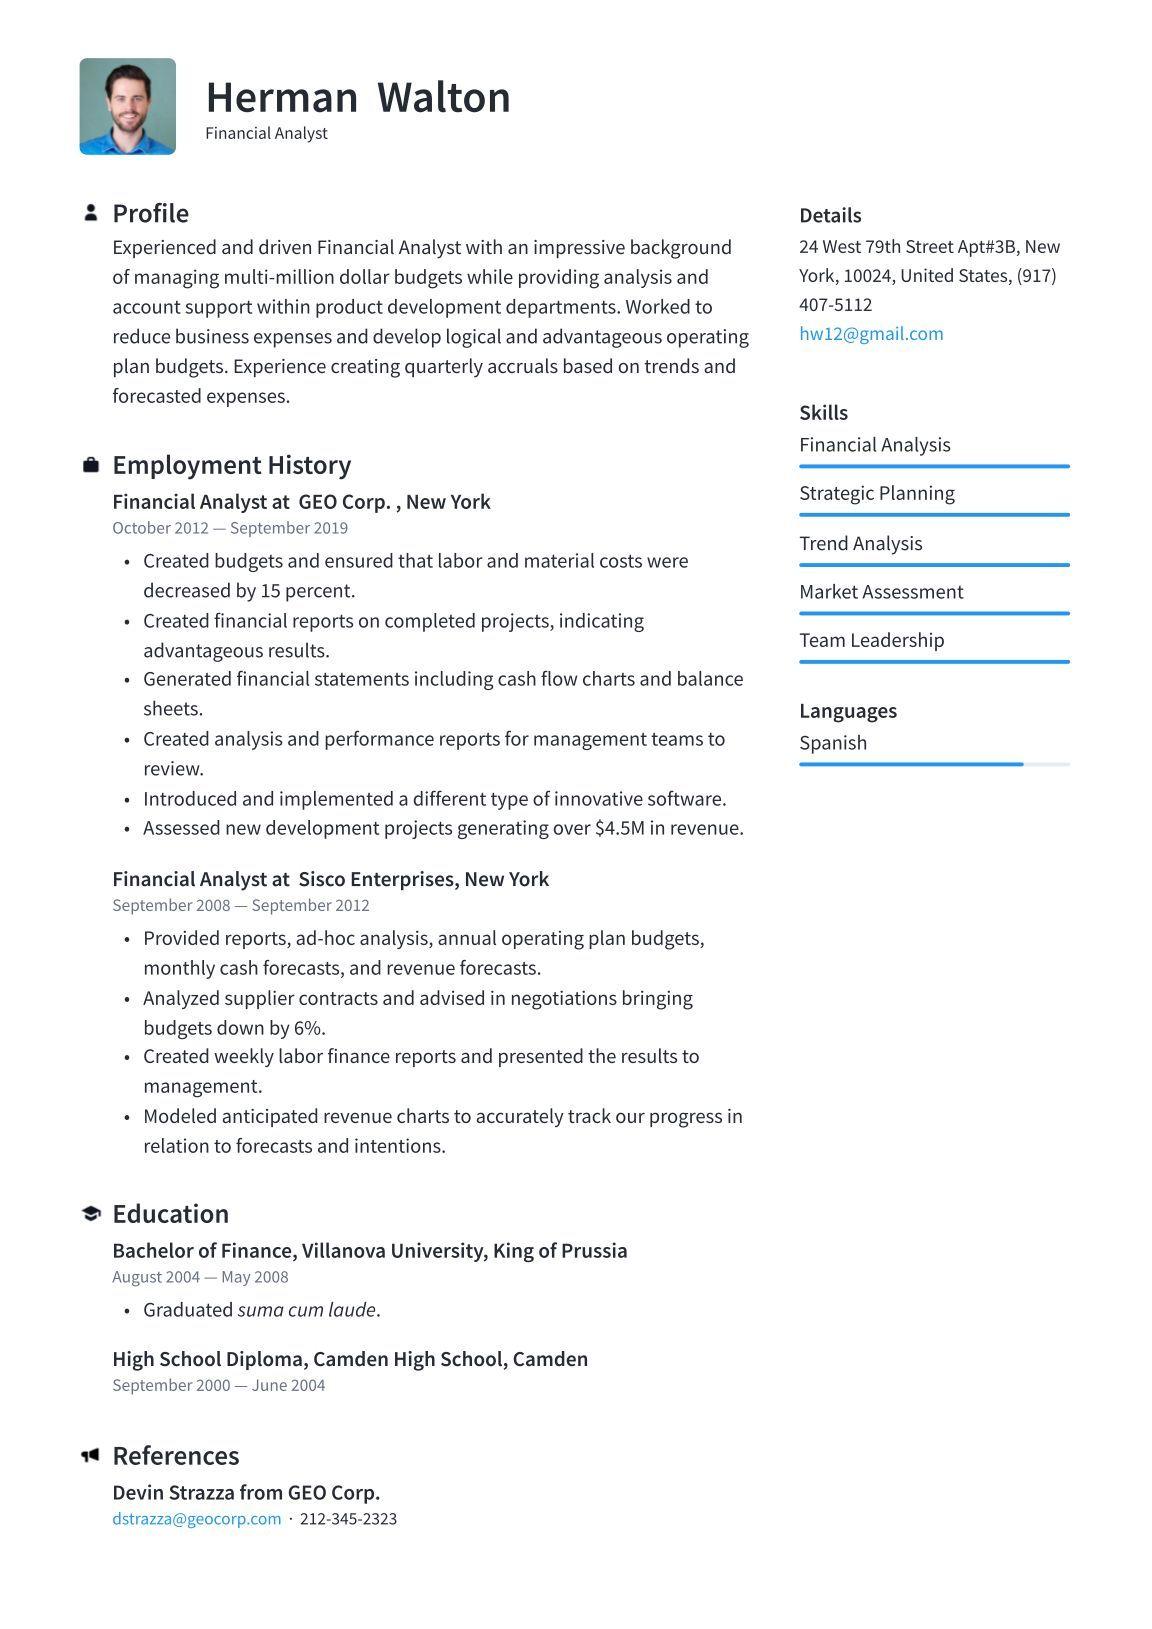 Resume Builder · Resume.io